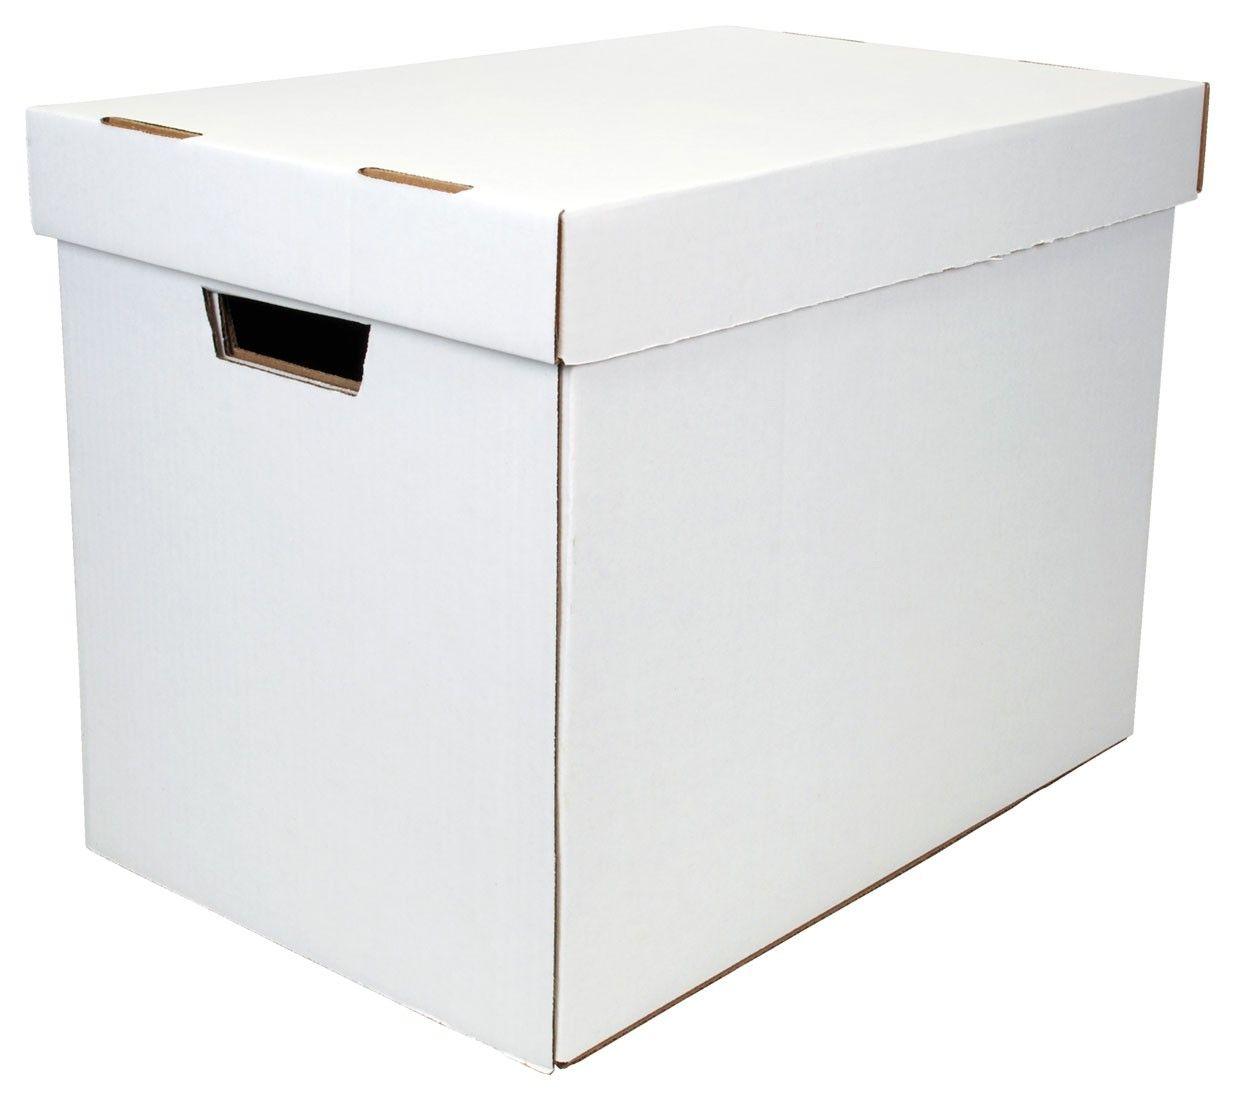 11x17 Storage Box Storage Storage Box File Storage